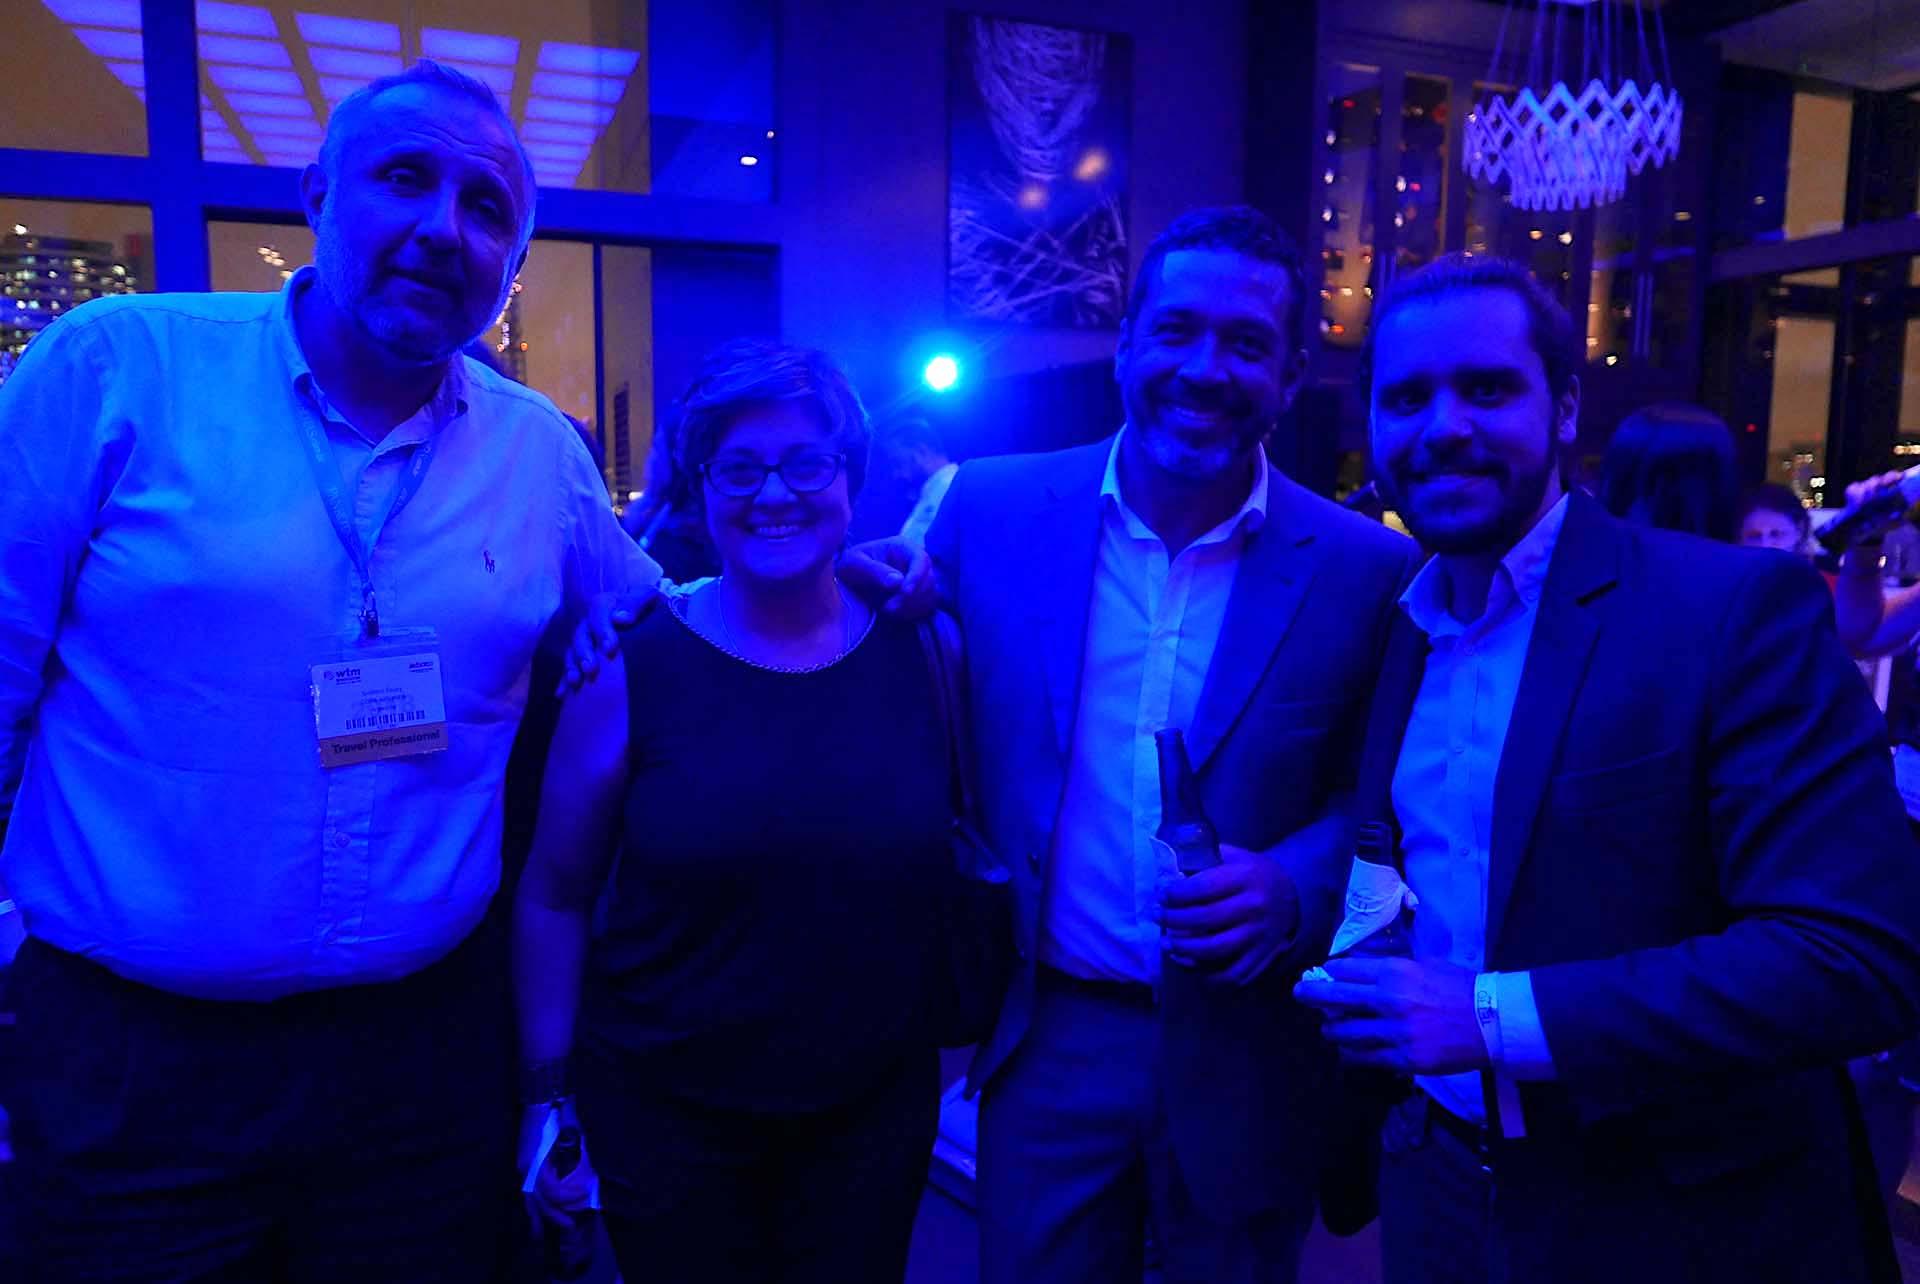 Gustavo Esusy, Nadia Kardouss, da Aviareps, Jorge Souza, e Jean-Bruno Gillot